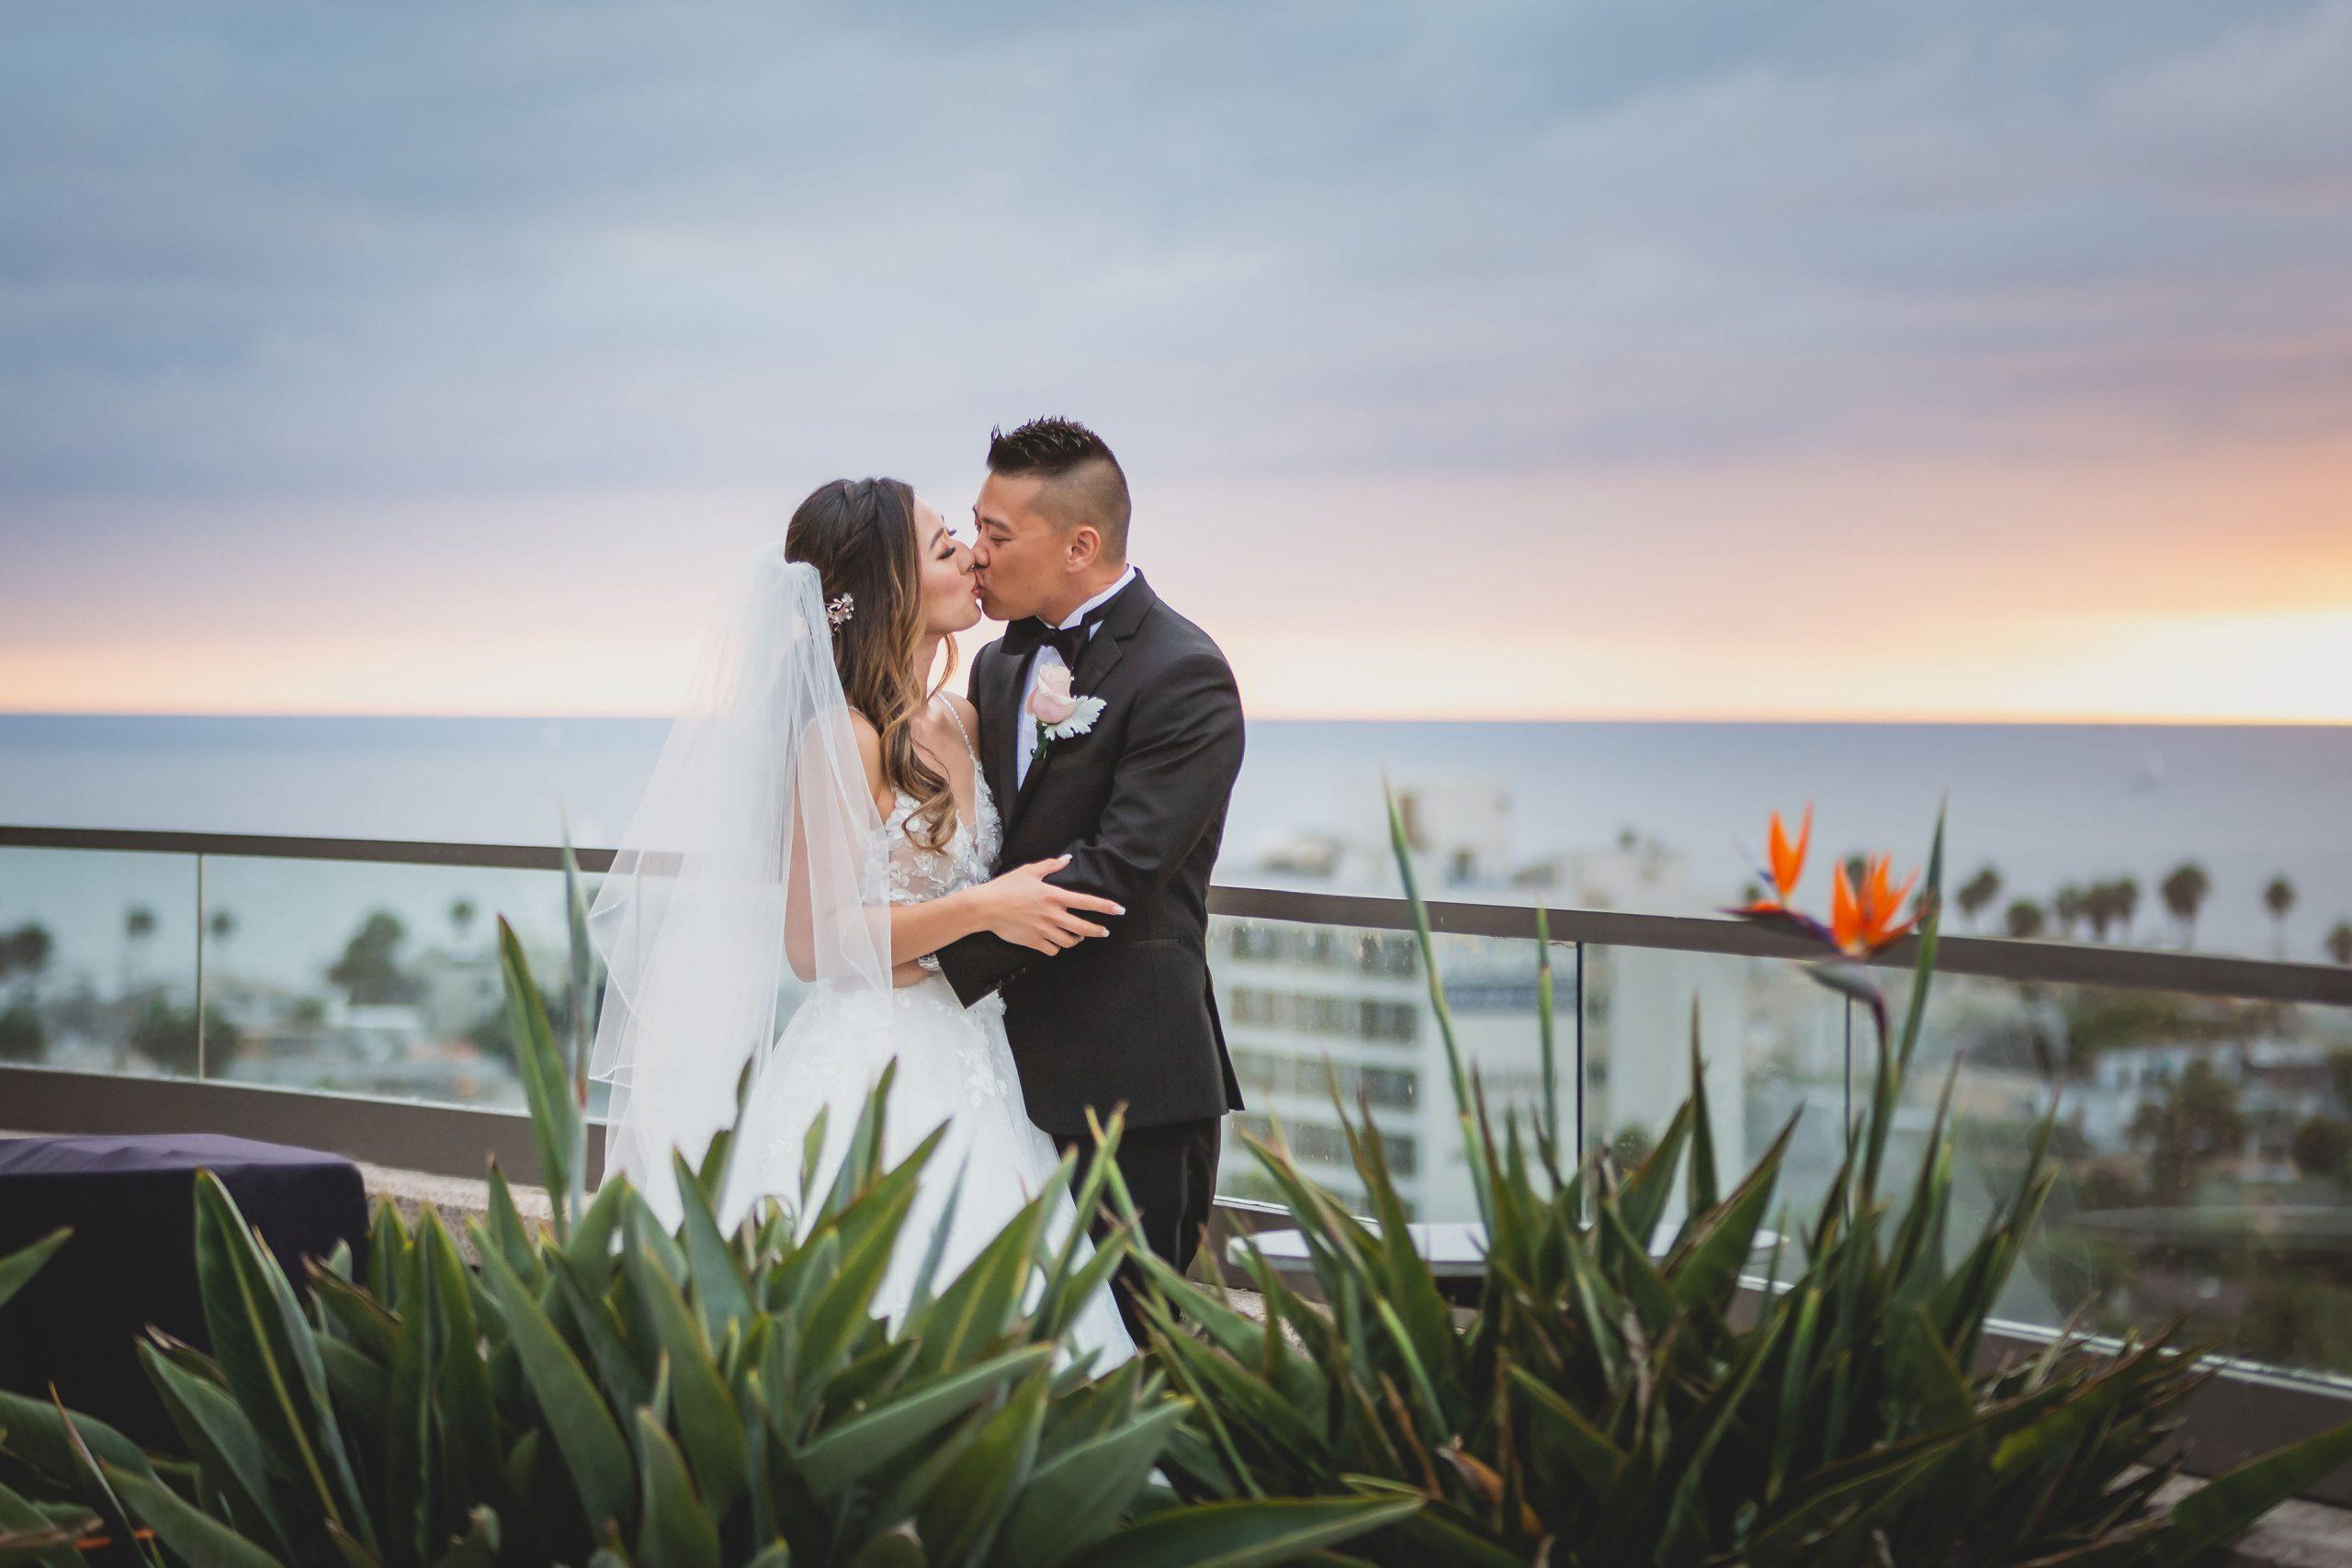 Lam sneak peak, wedding videography, Yors Truly Media